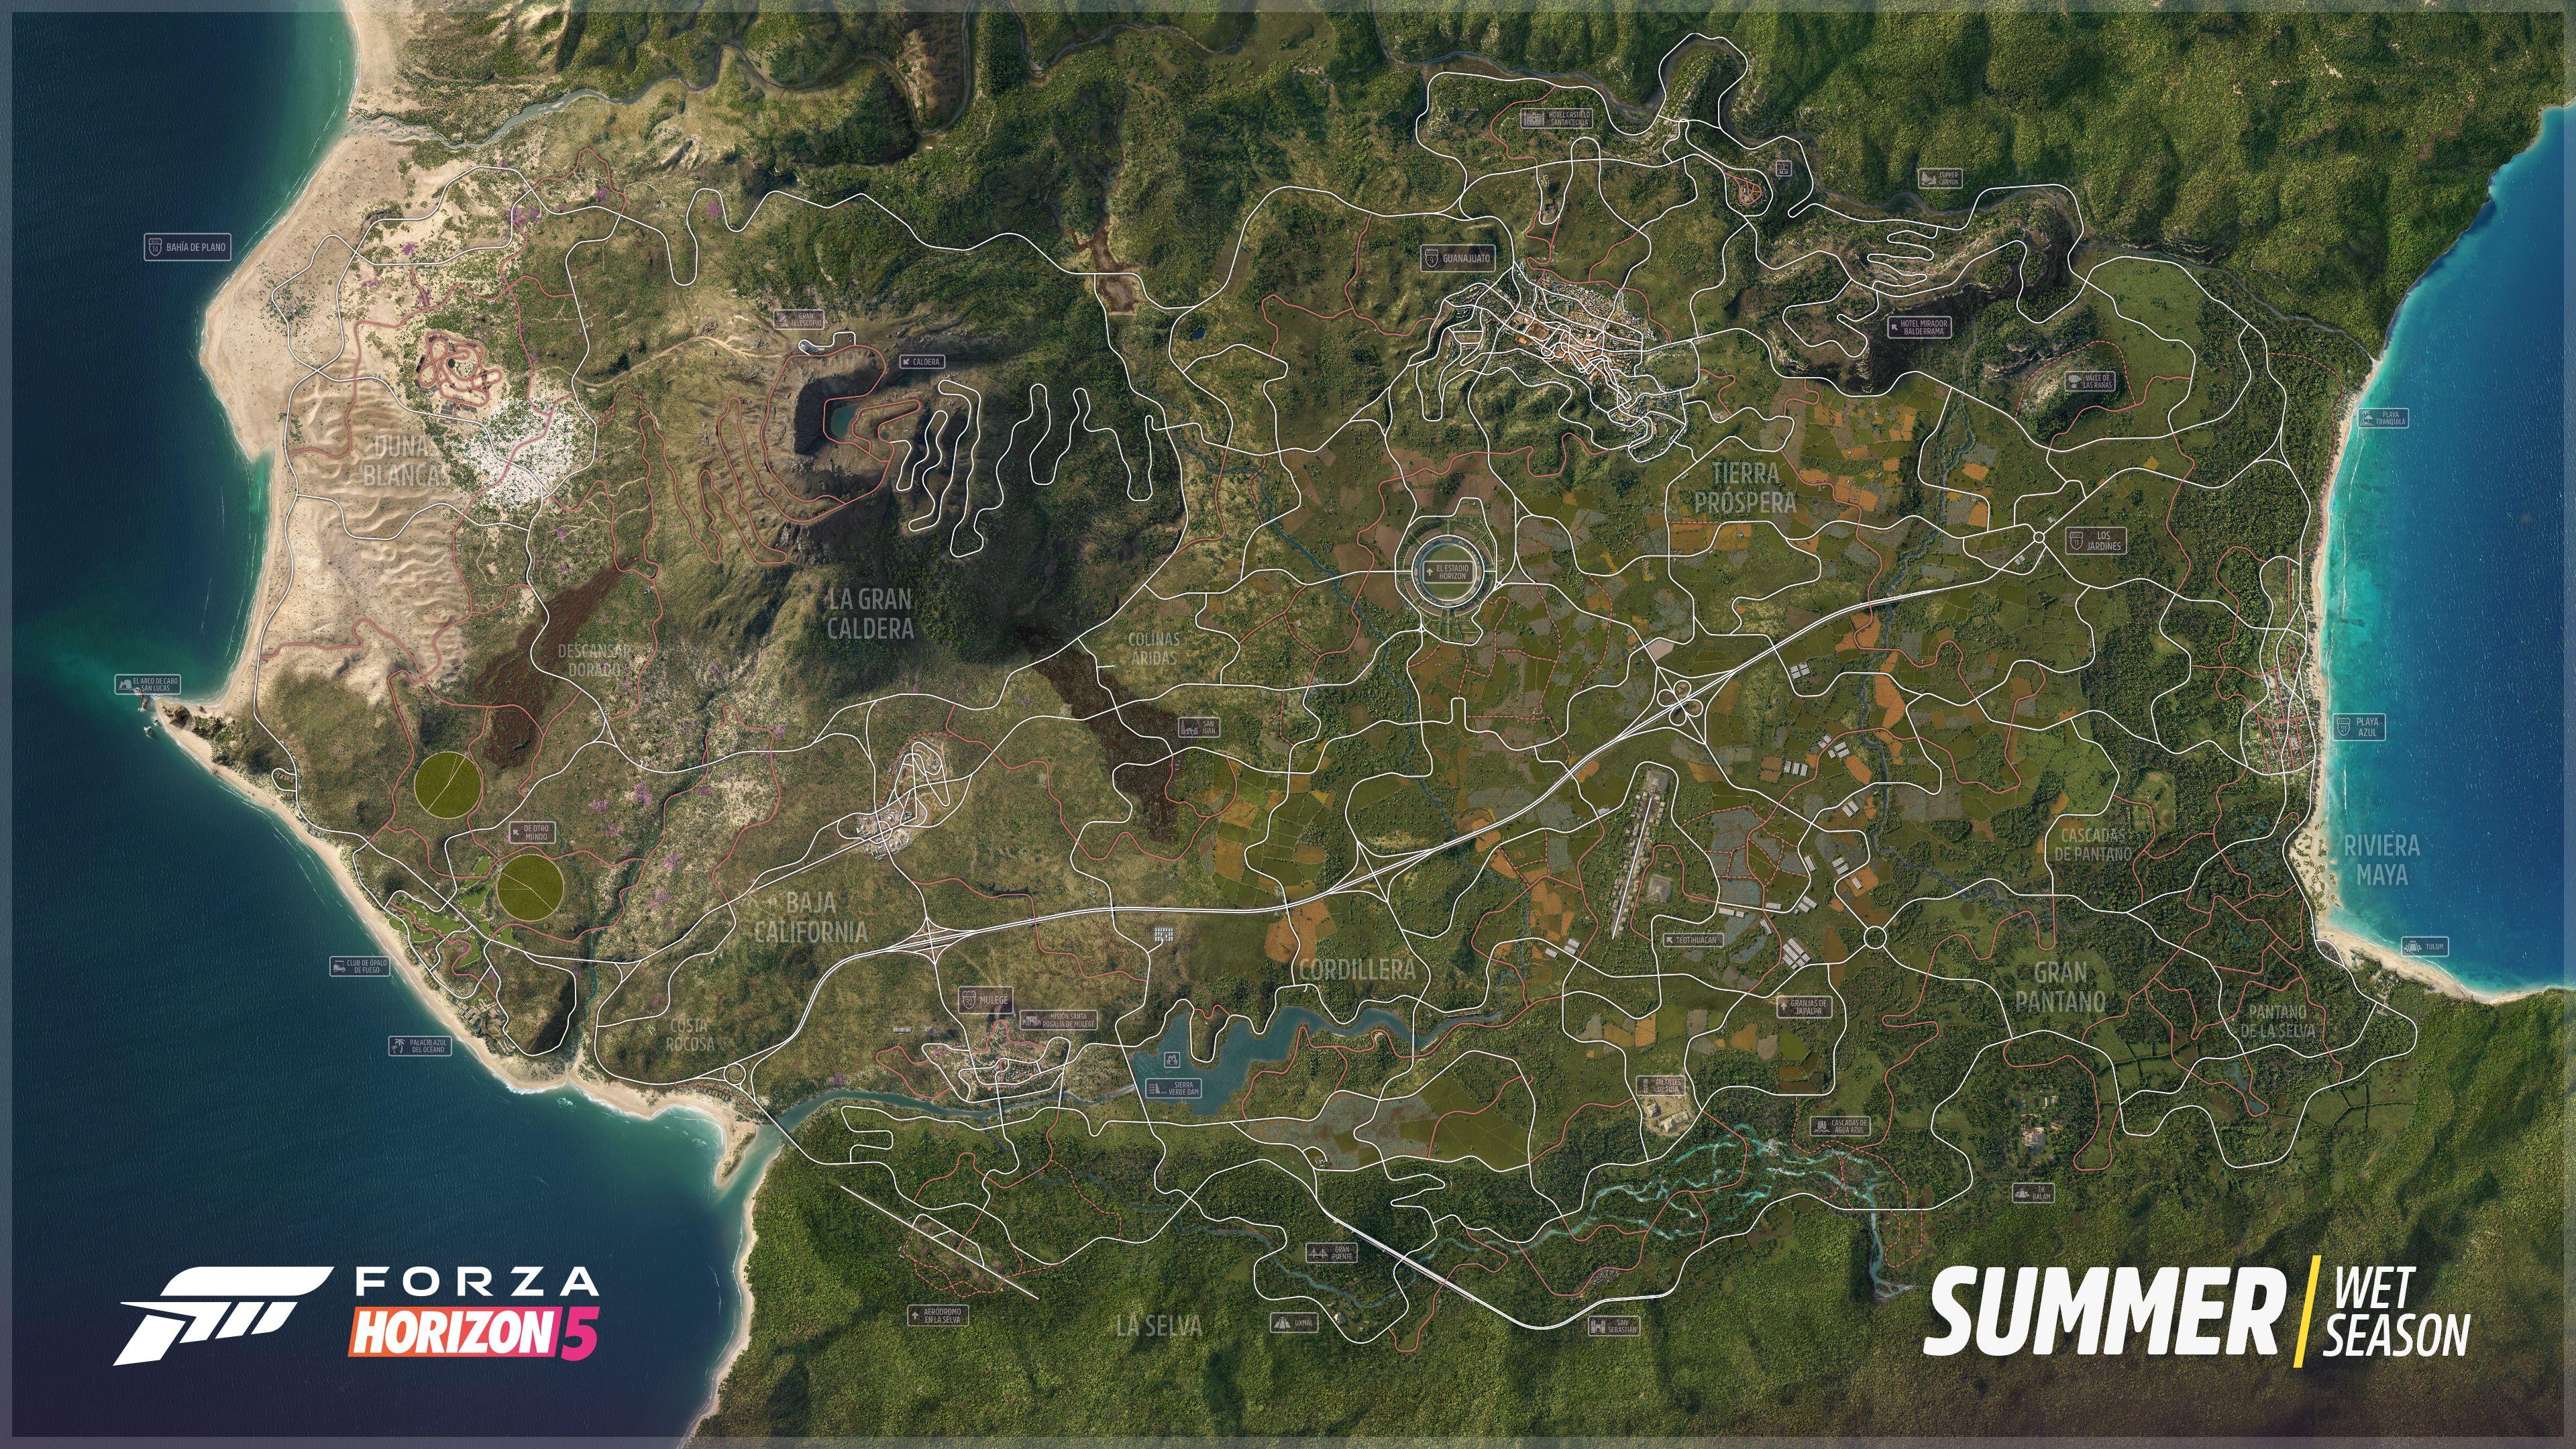 Oficjalna mapa Forza Horizon 5 - Meksyk - fot. Microsoft